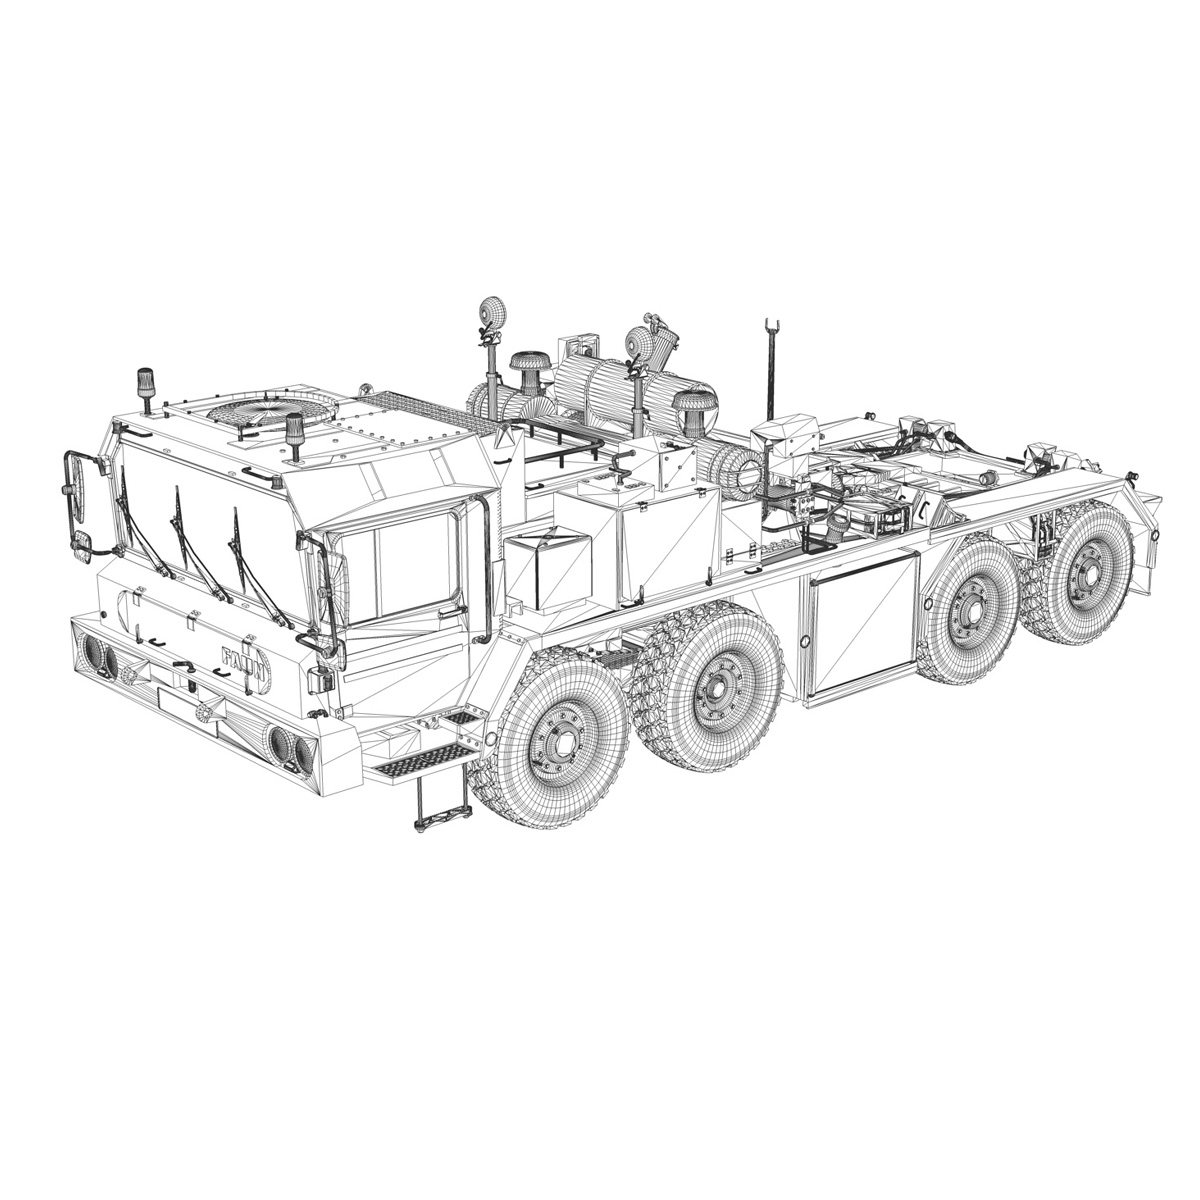 faun stl-56 transportues tank 3d model 3ds fbx c4d lwo obj 201921